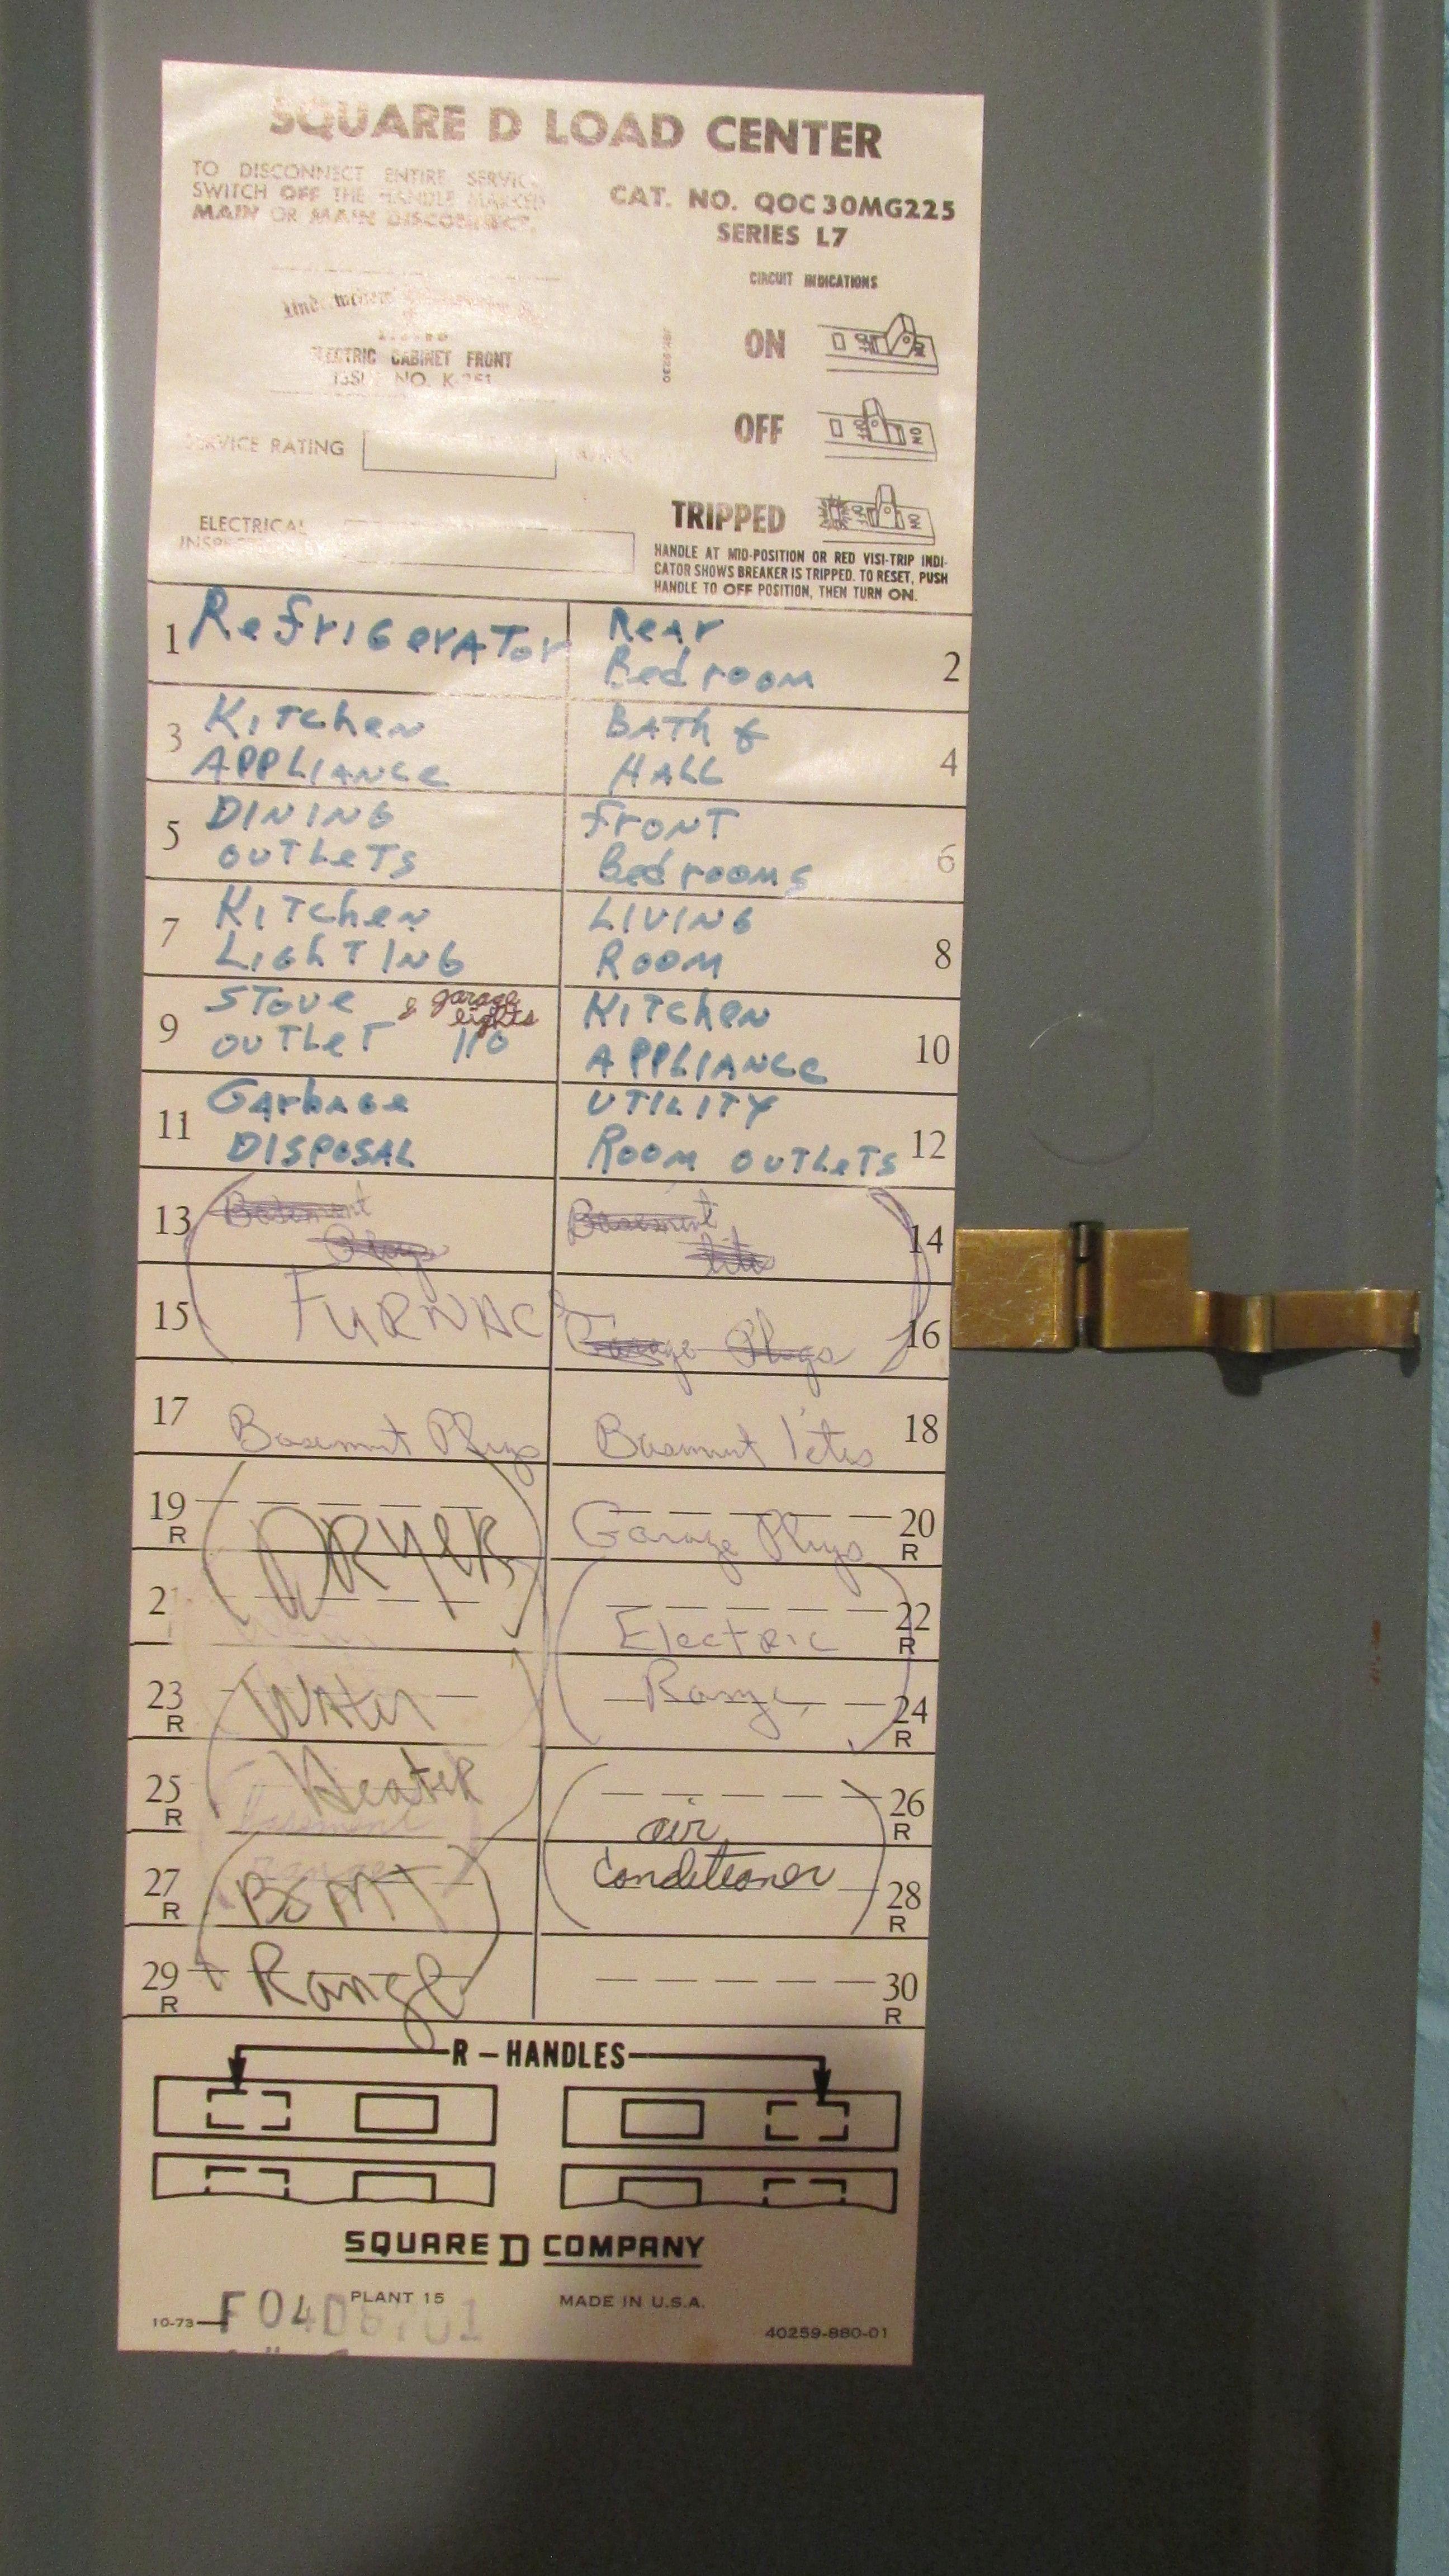 Description of circuit breakers